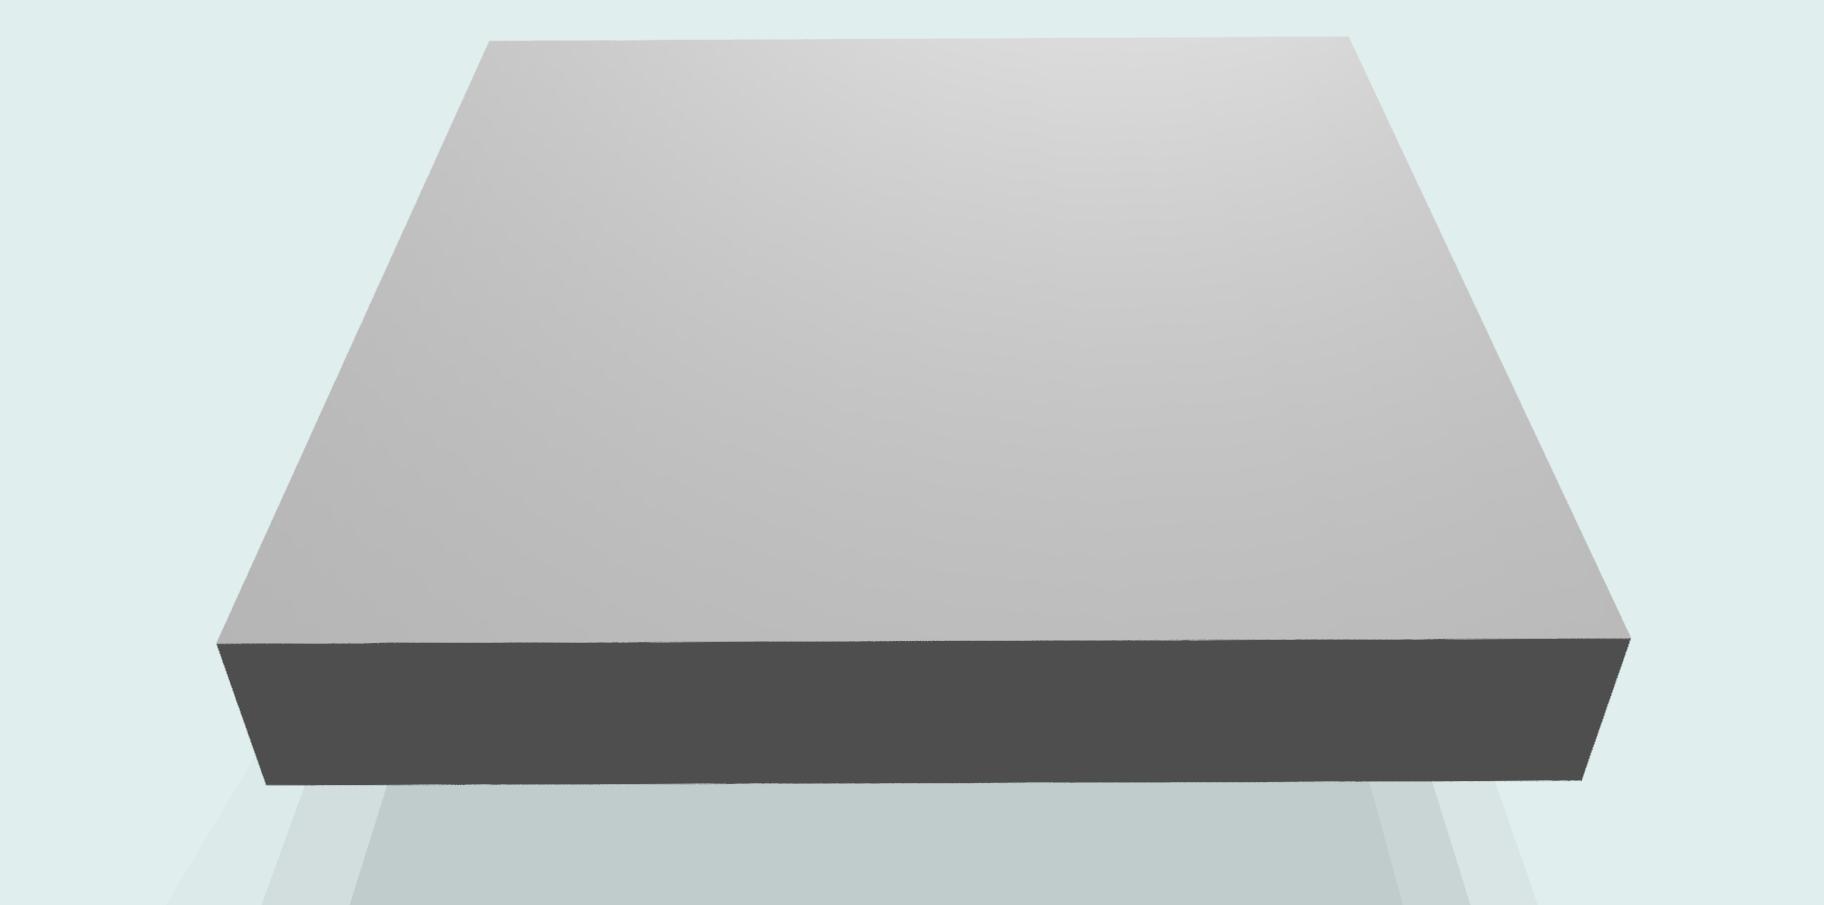 Tischplatte 28 mm melaminharzbeschichtet RAL 7035, grau